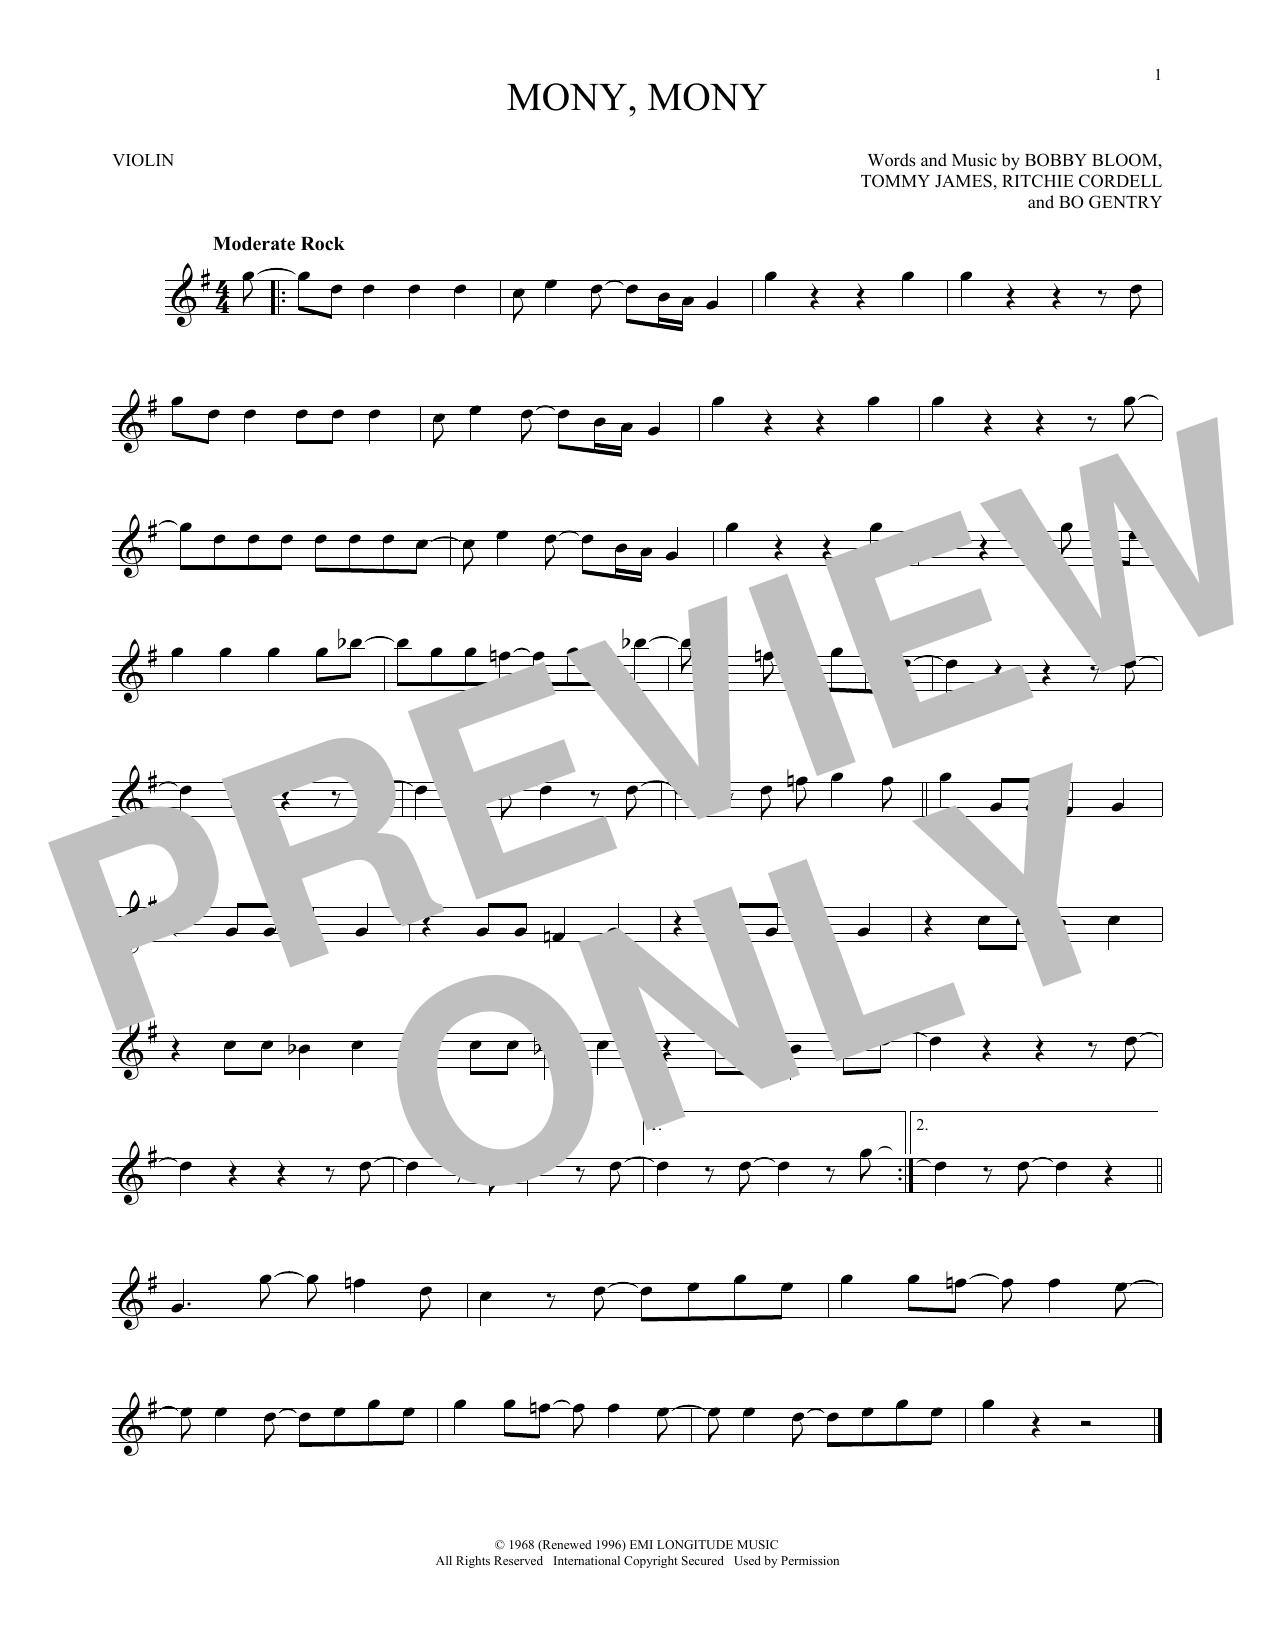 Mony, Mony (Violin Solo)